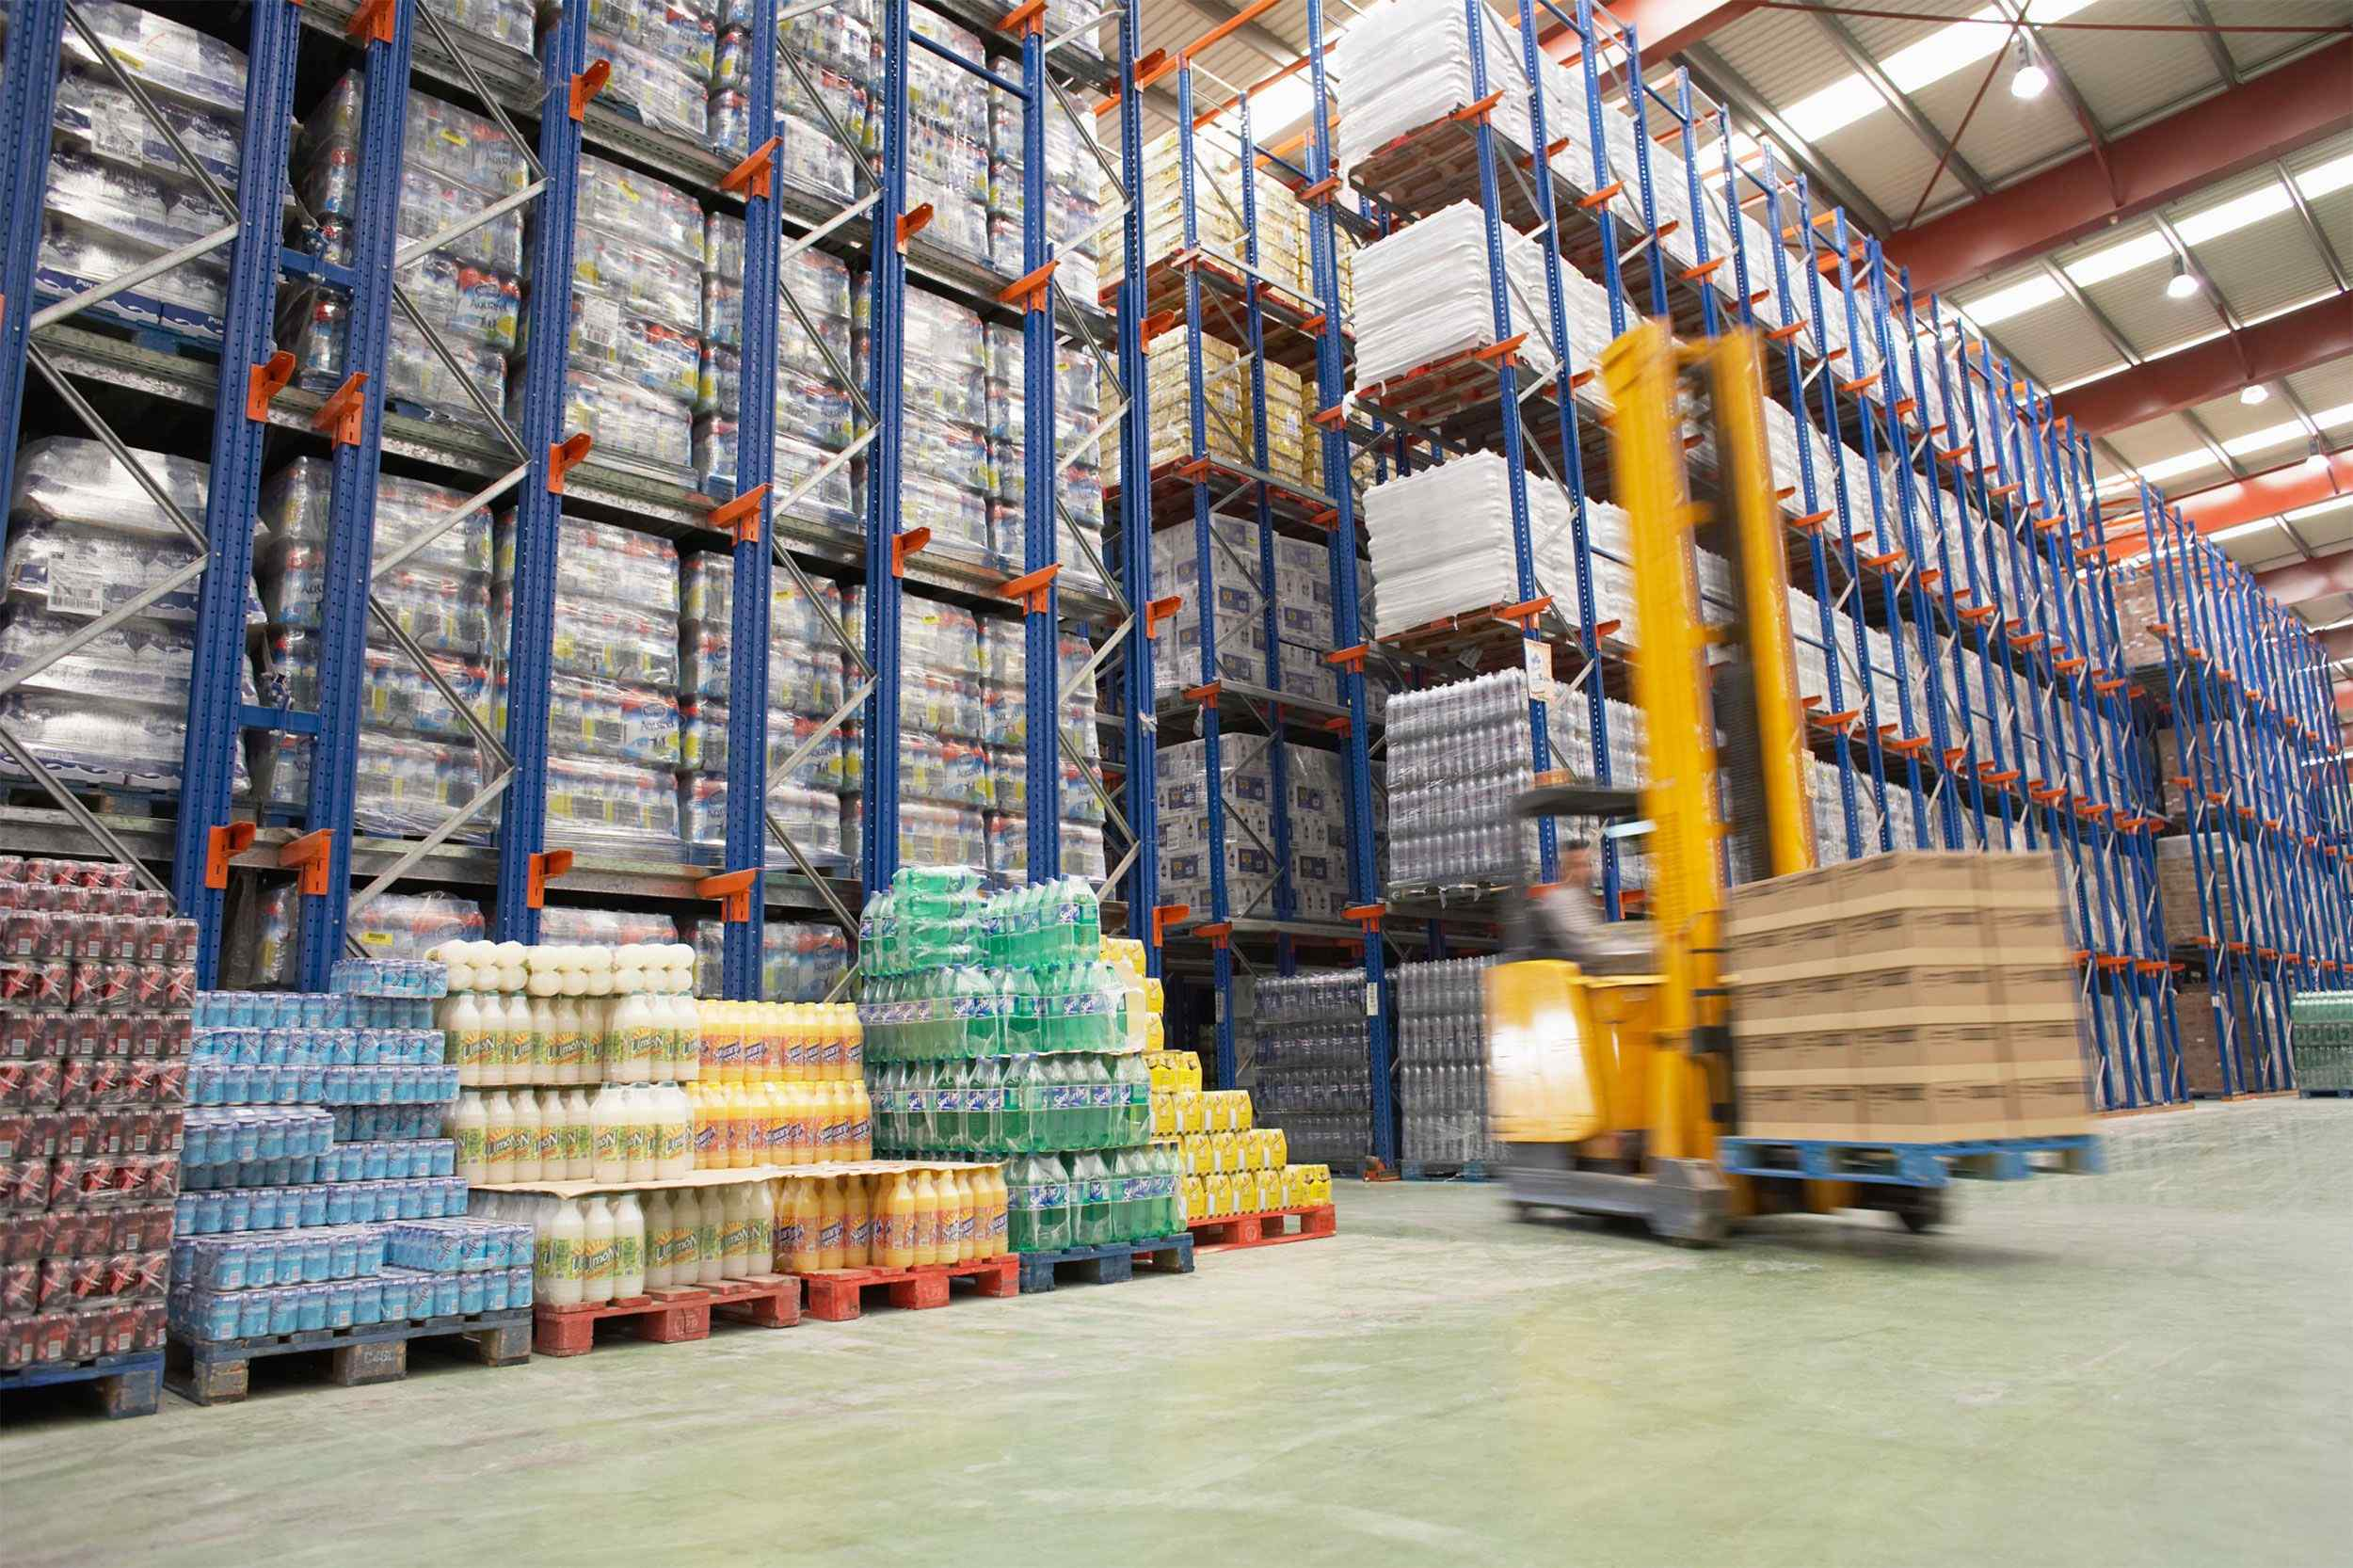 https://www.tuninglogistics.com/wp-content/uploads/2015/09/Warehouse-and-lifter.jpg